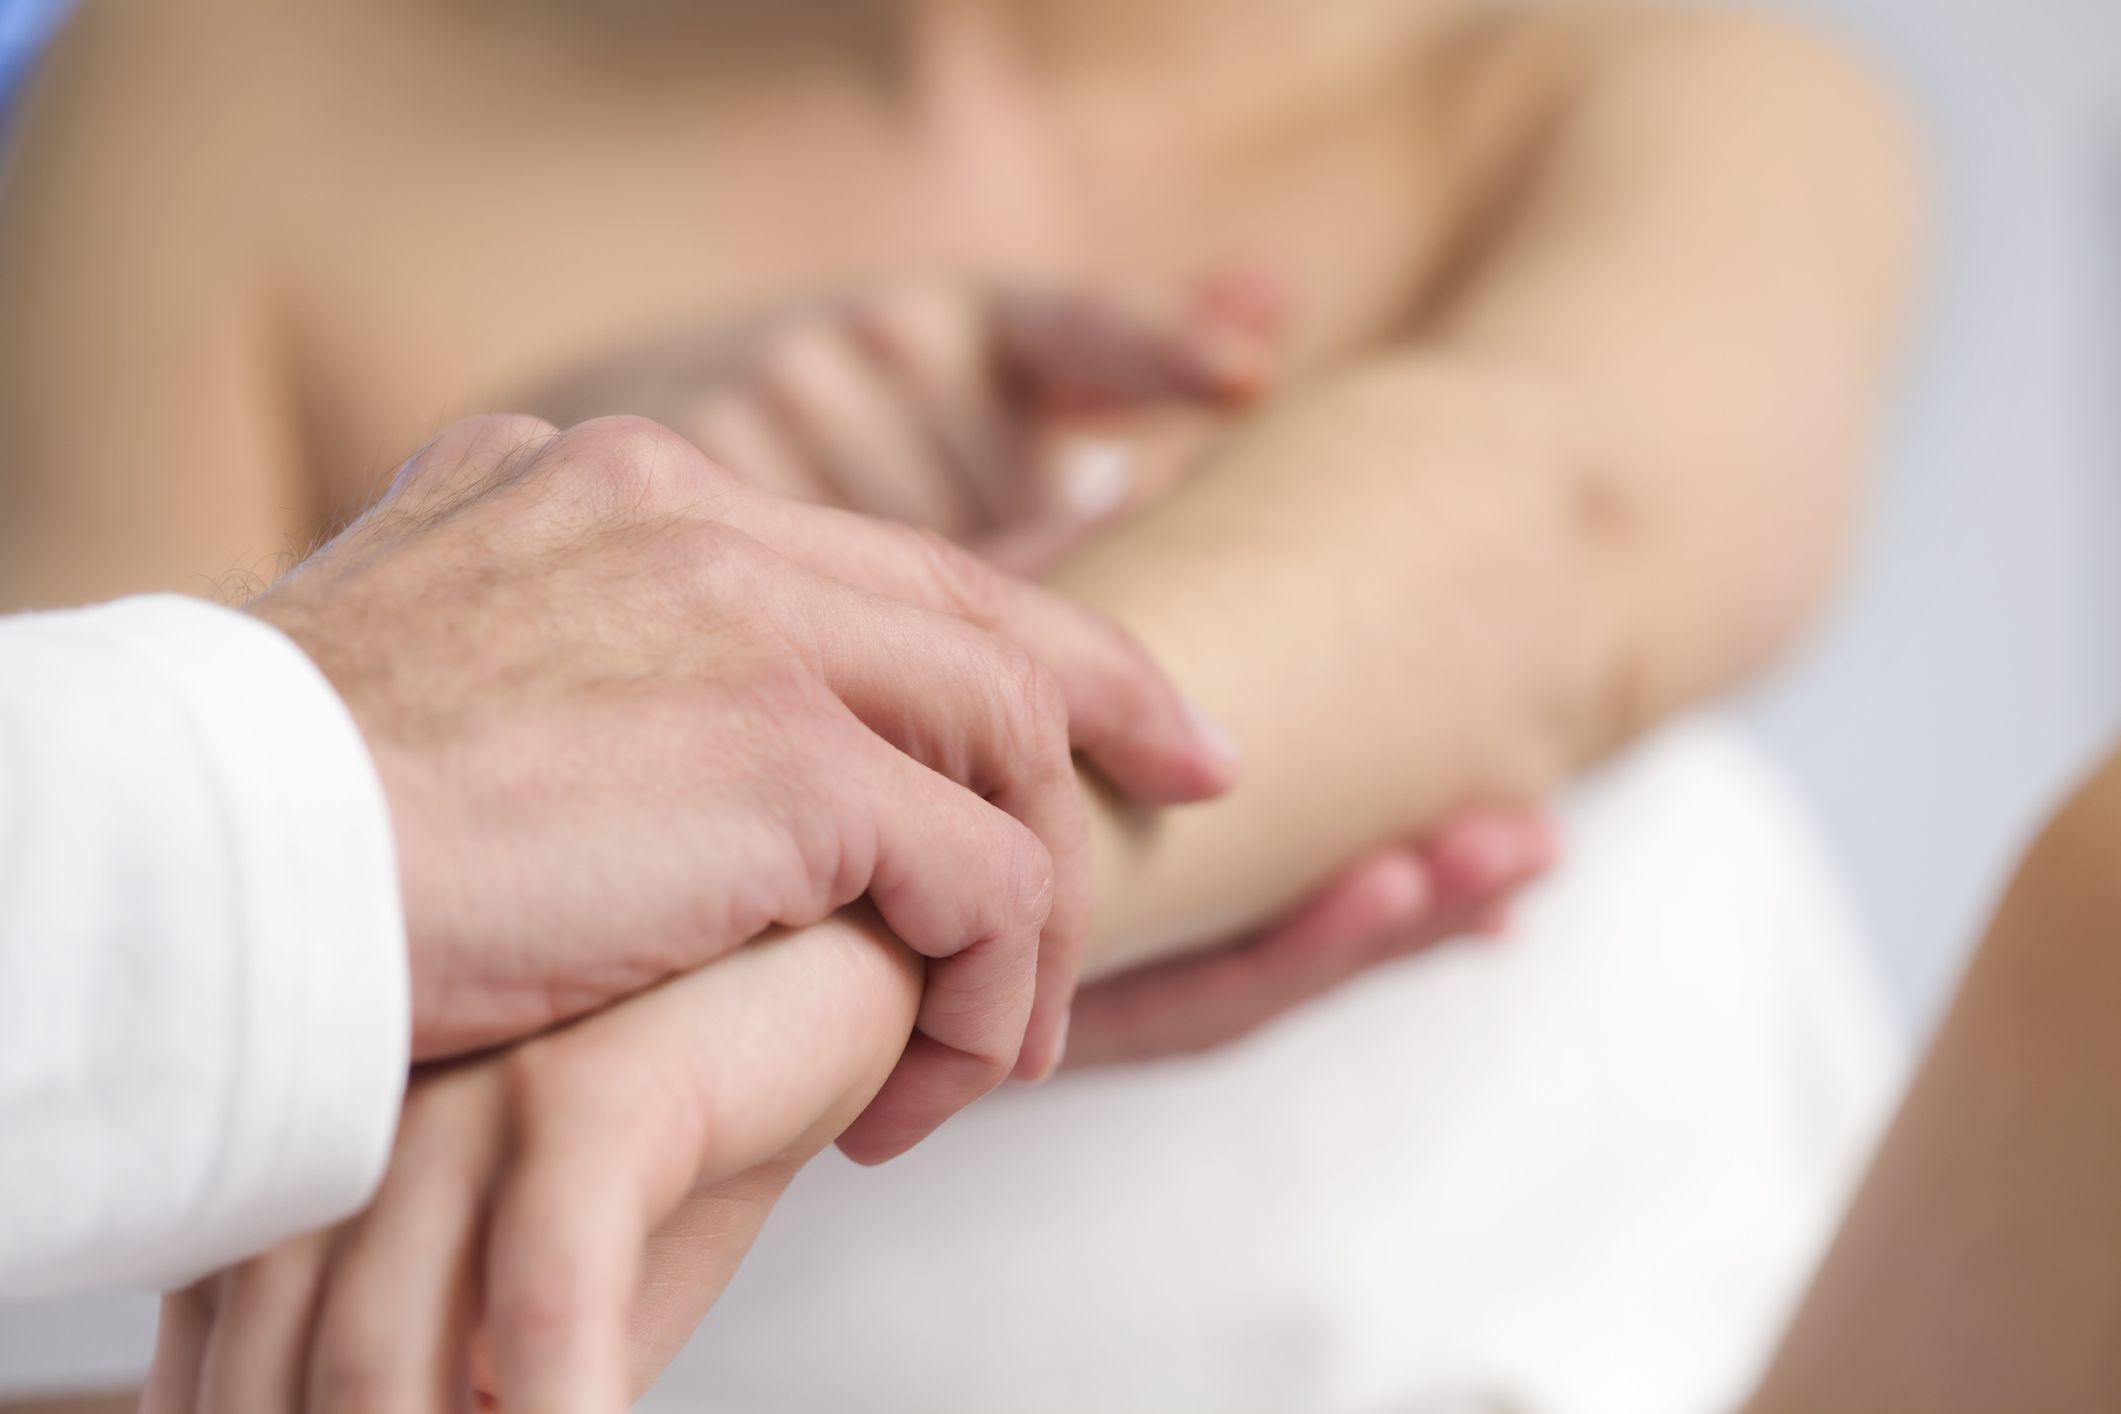 doctor examining arm of patient